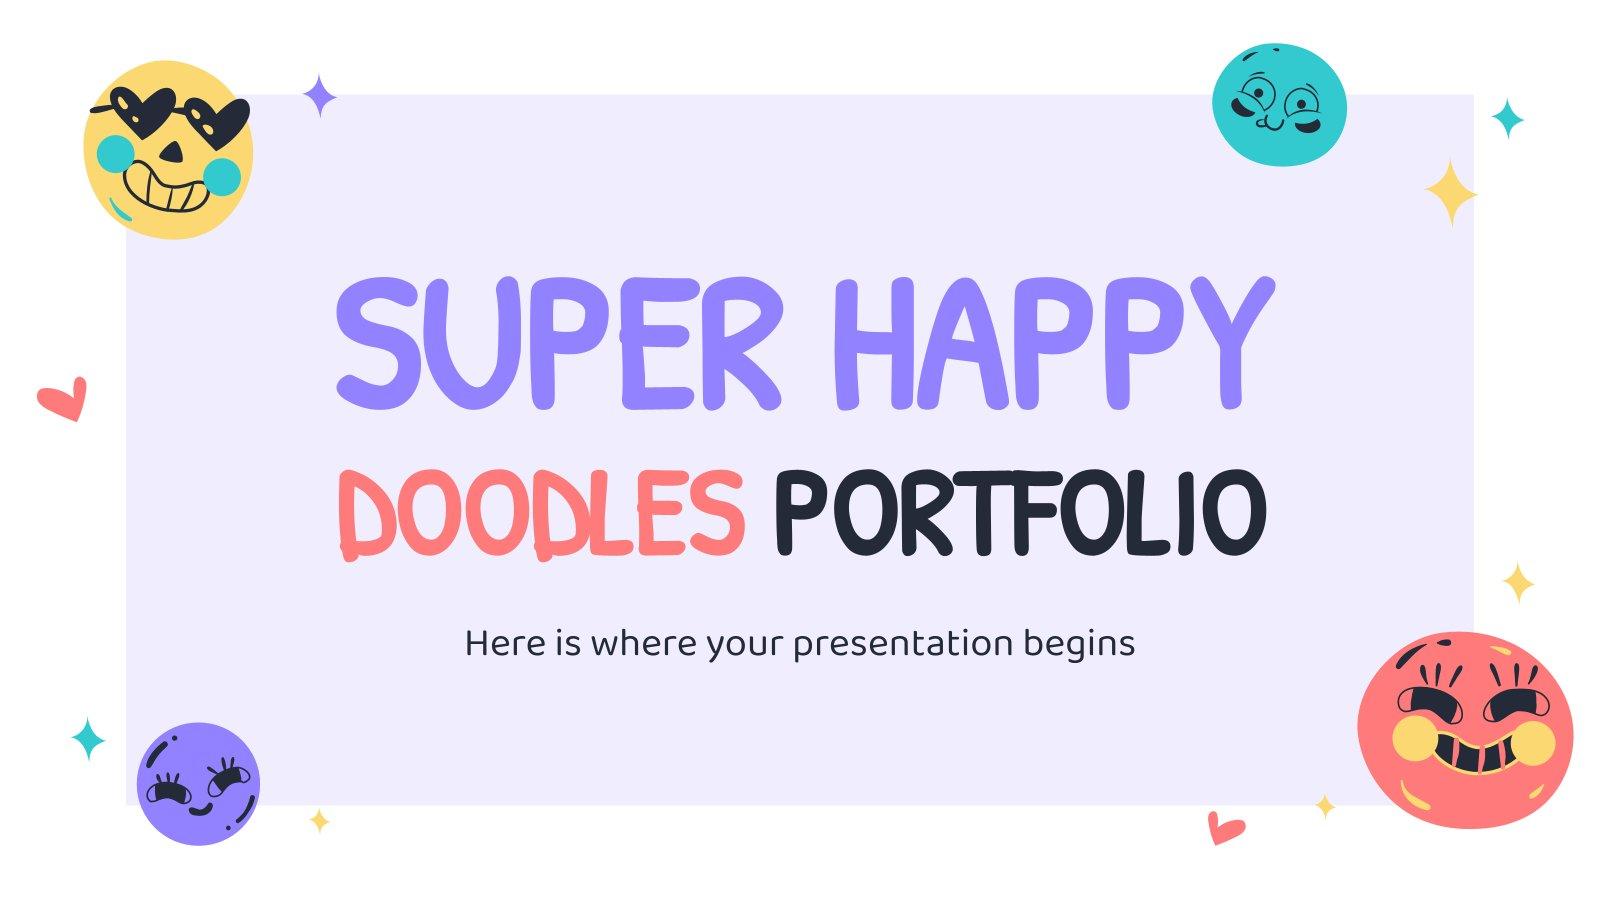 Super Happy Doodles Portfolio presentation template